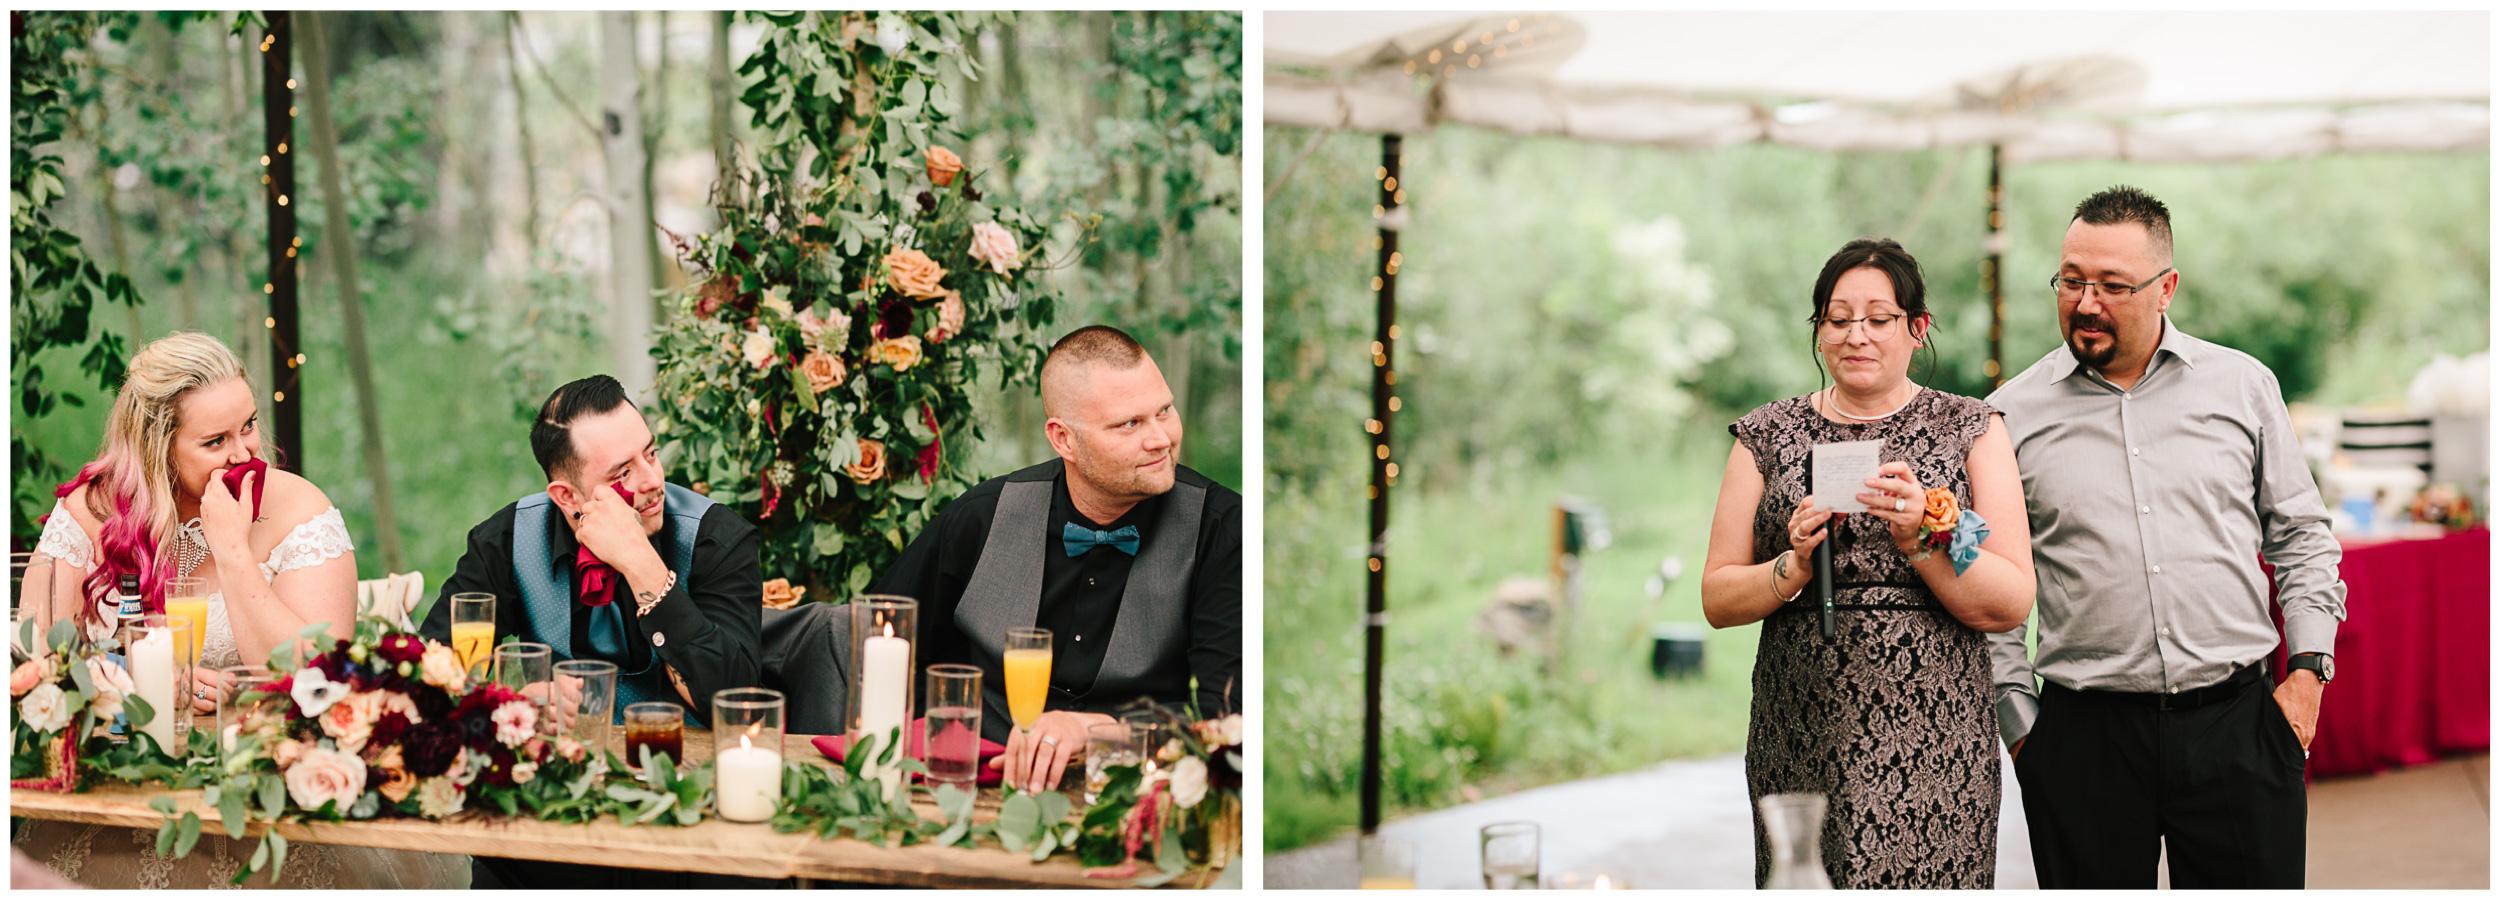 blackstone_rivers_ranch_wedding_80.jpg